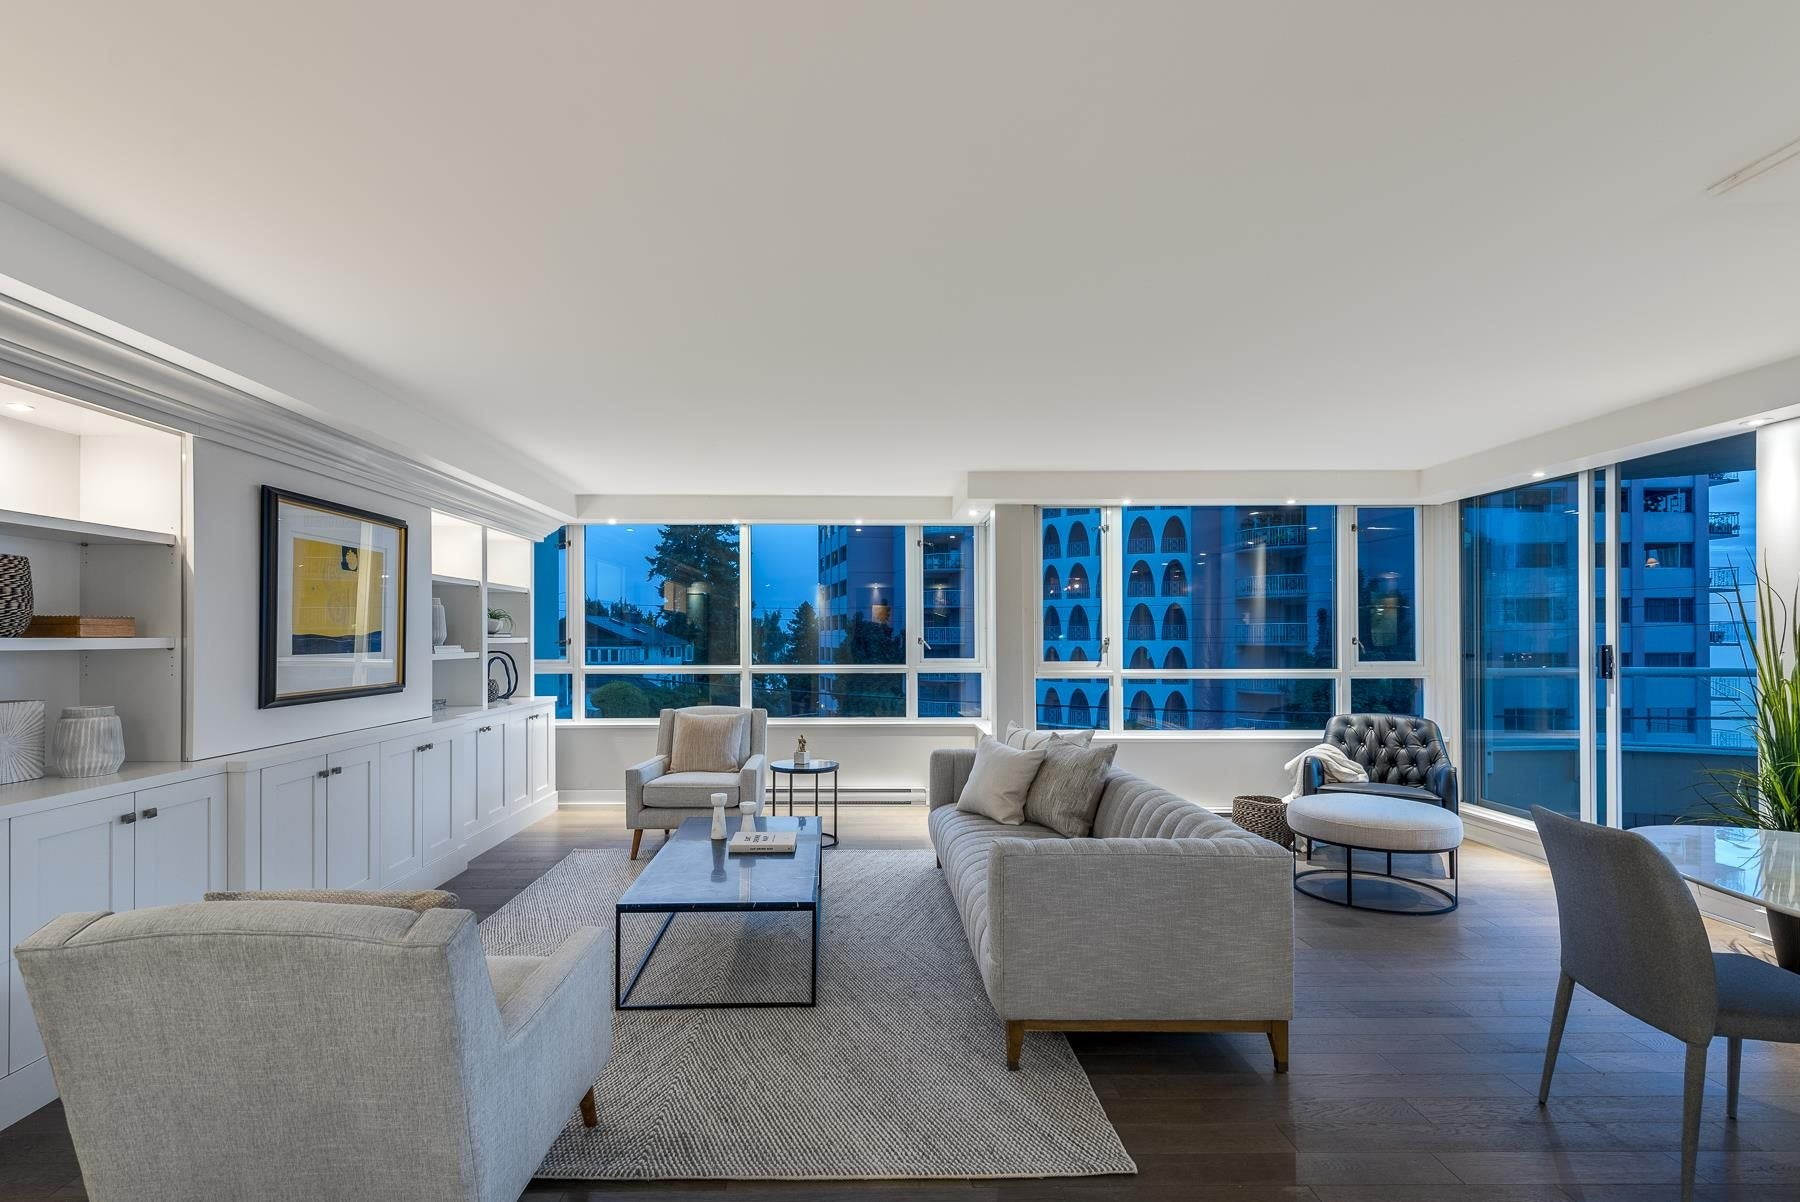 303 2203 BELLEVUE AVENUE - Dundarave Apartment/Condo for sale, 2 Bedrooms (R2595305) - #1